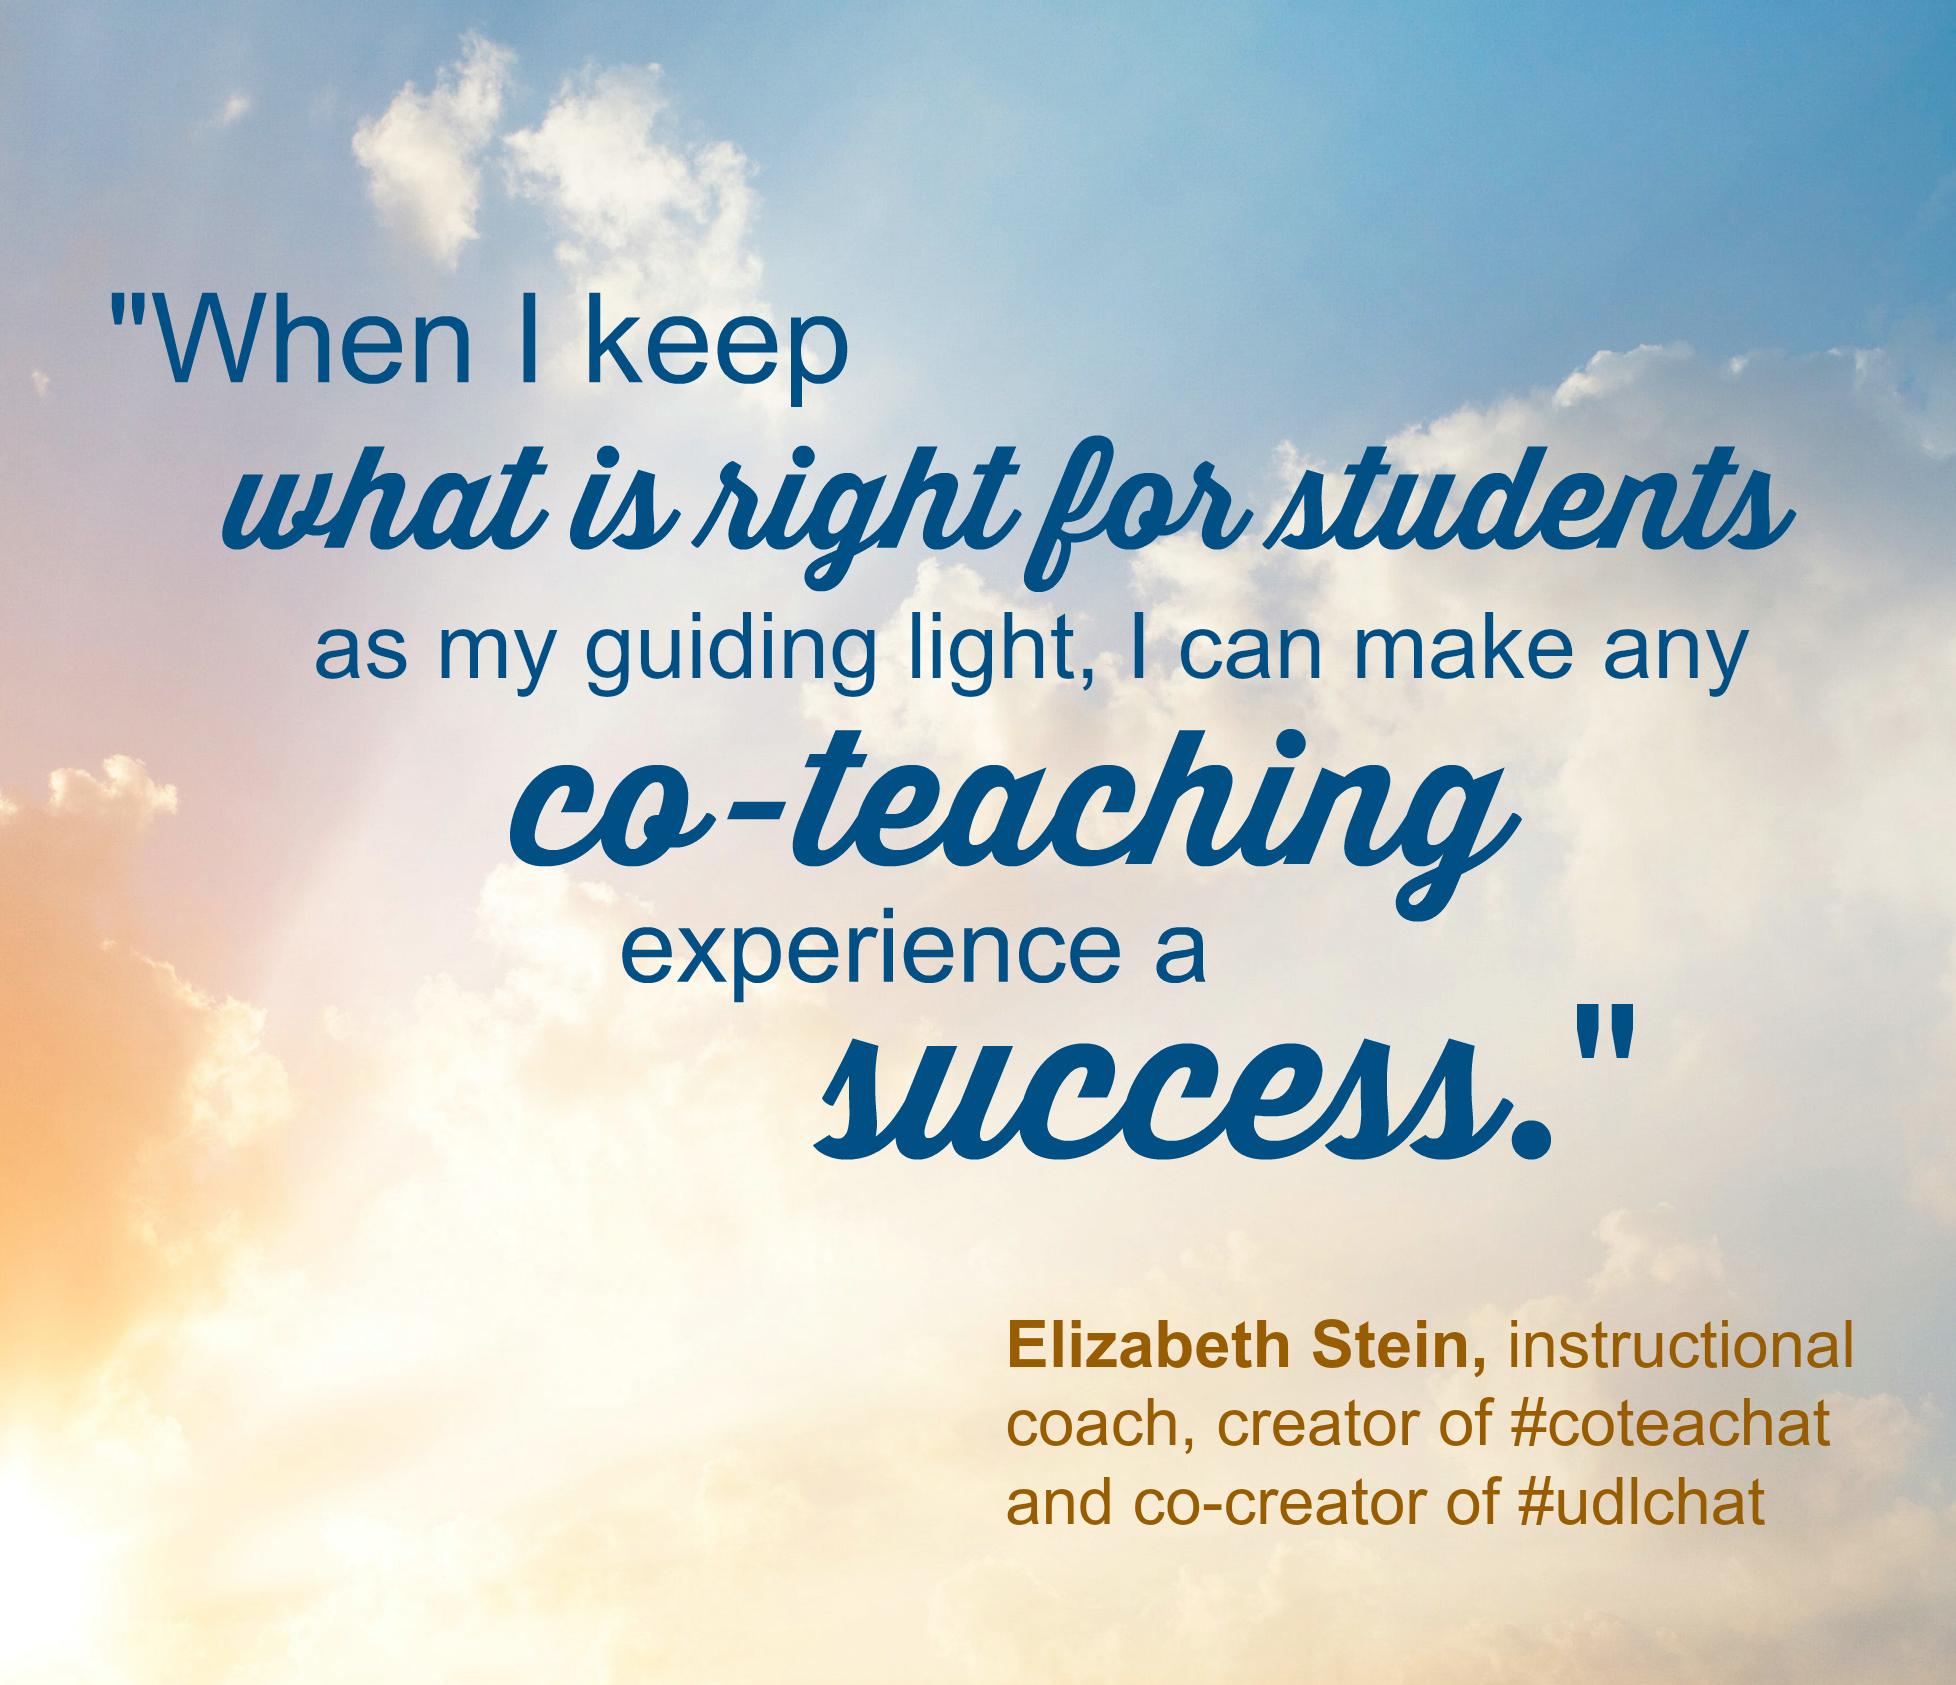 Elizabeth Stein co-teaching